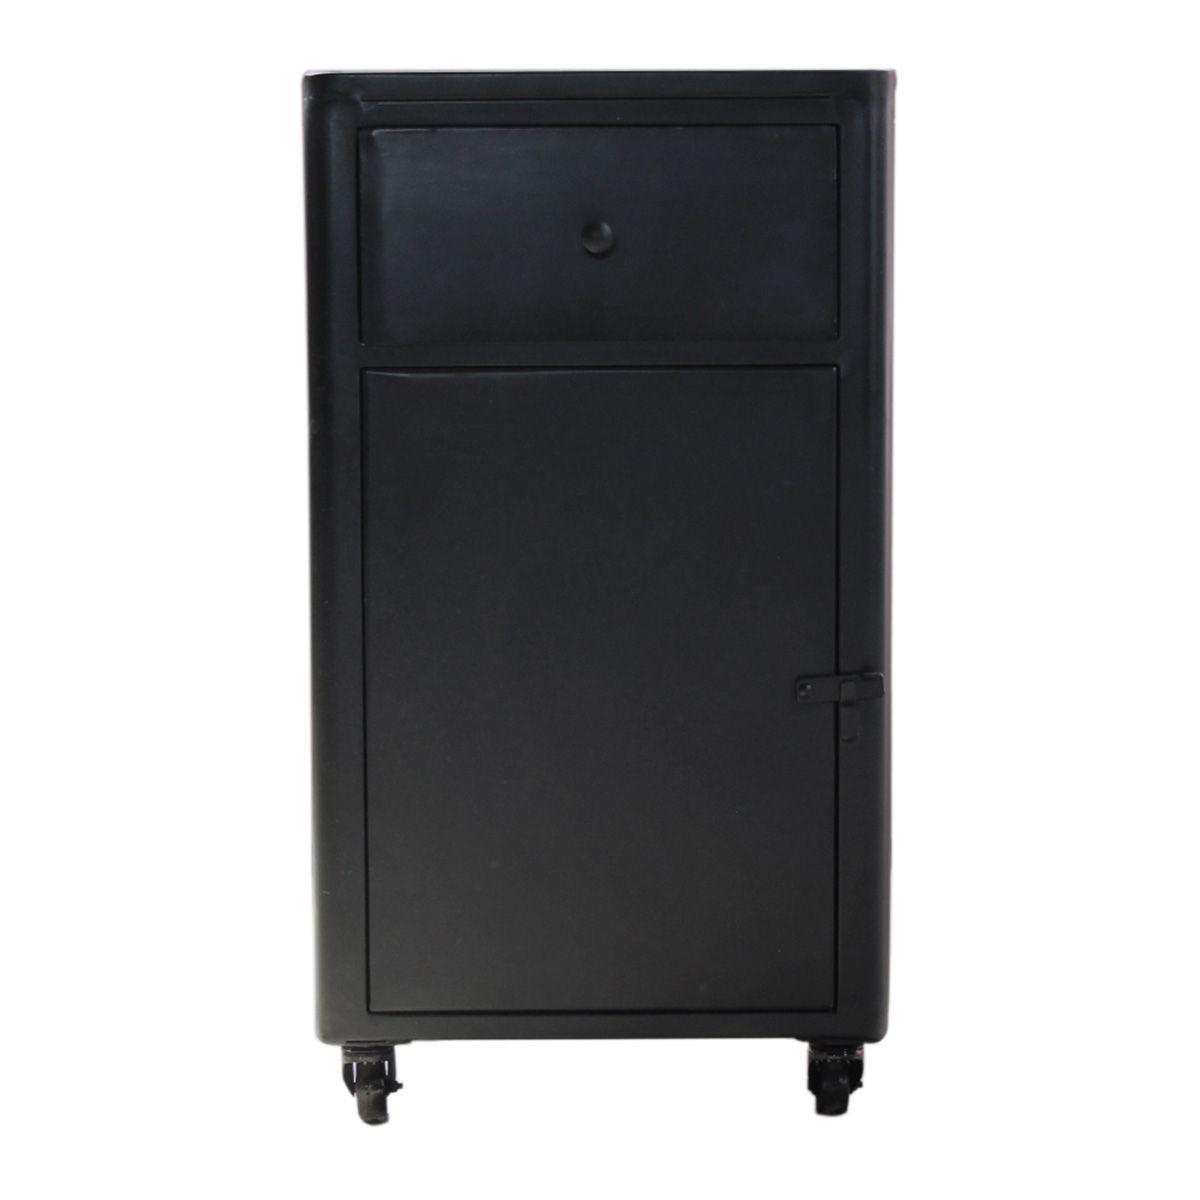 Petit buffet en métal 1 porte 1 tiroir noir (photo)